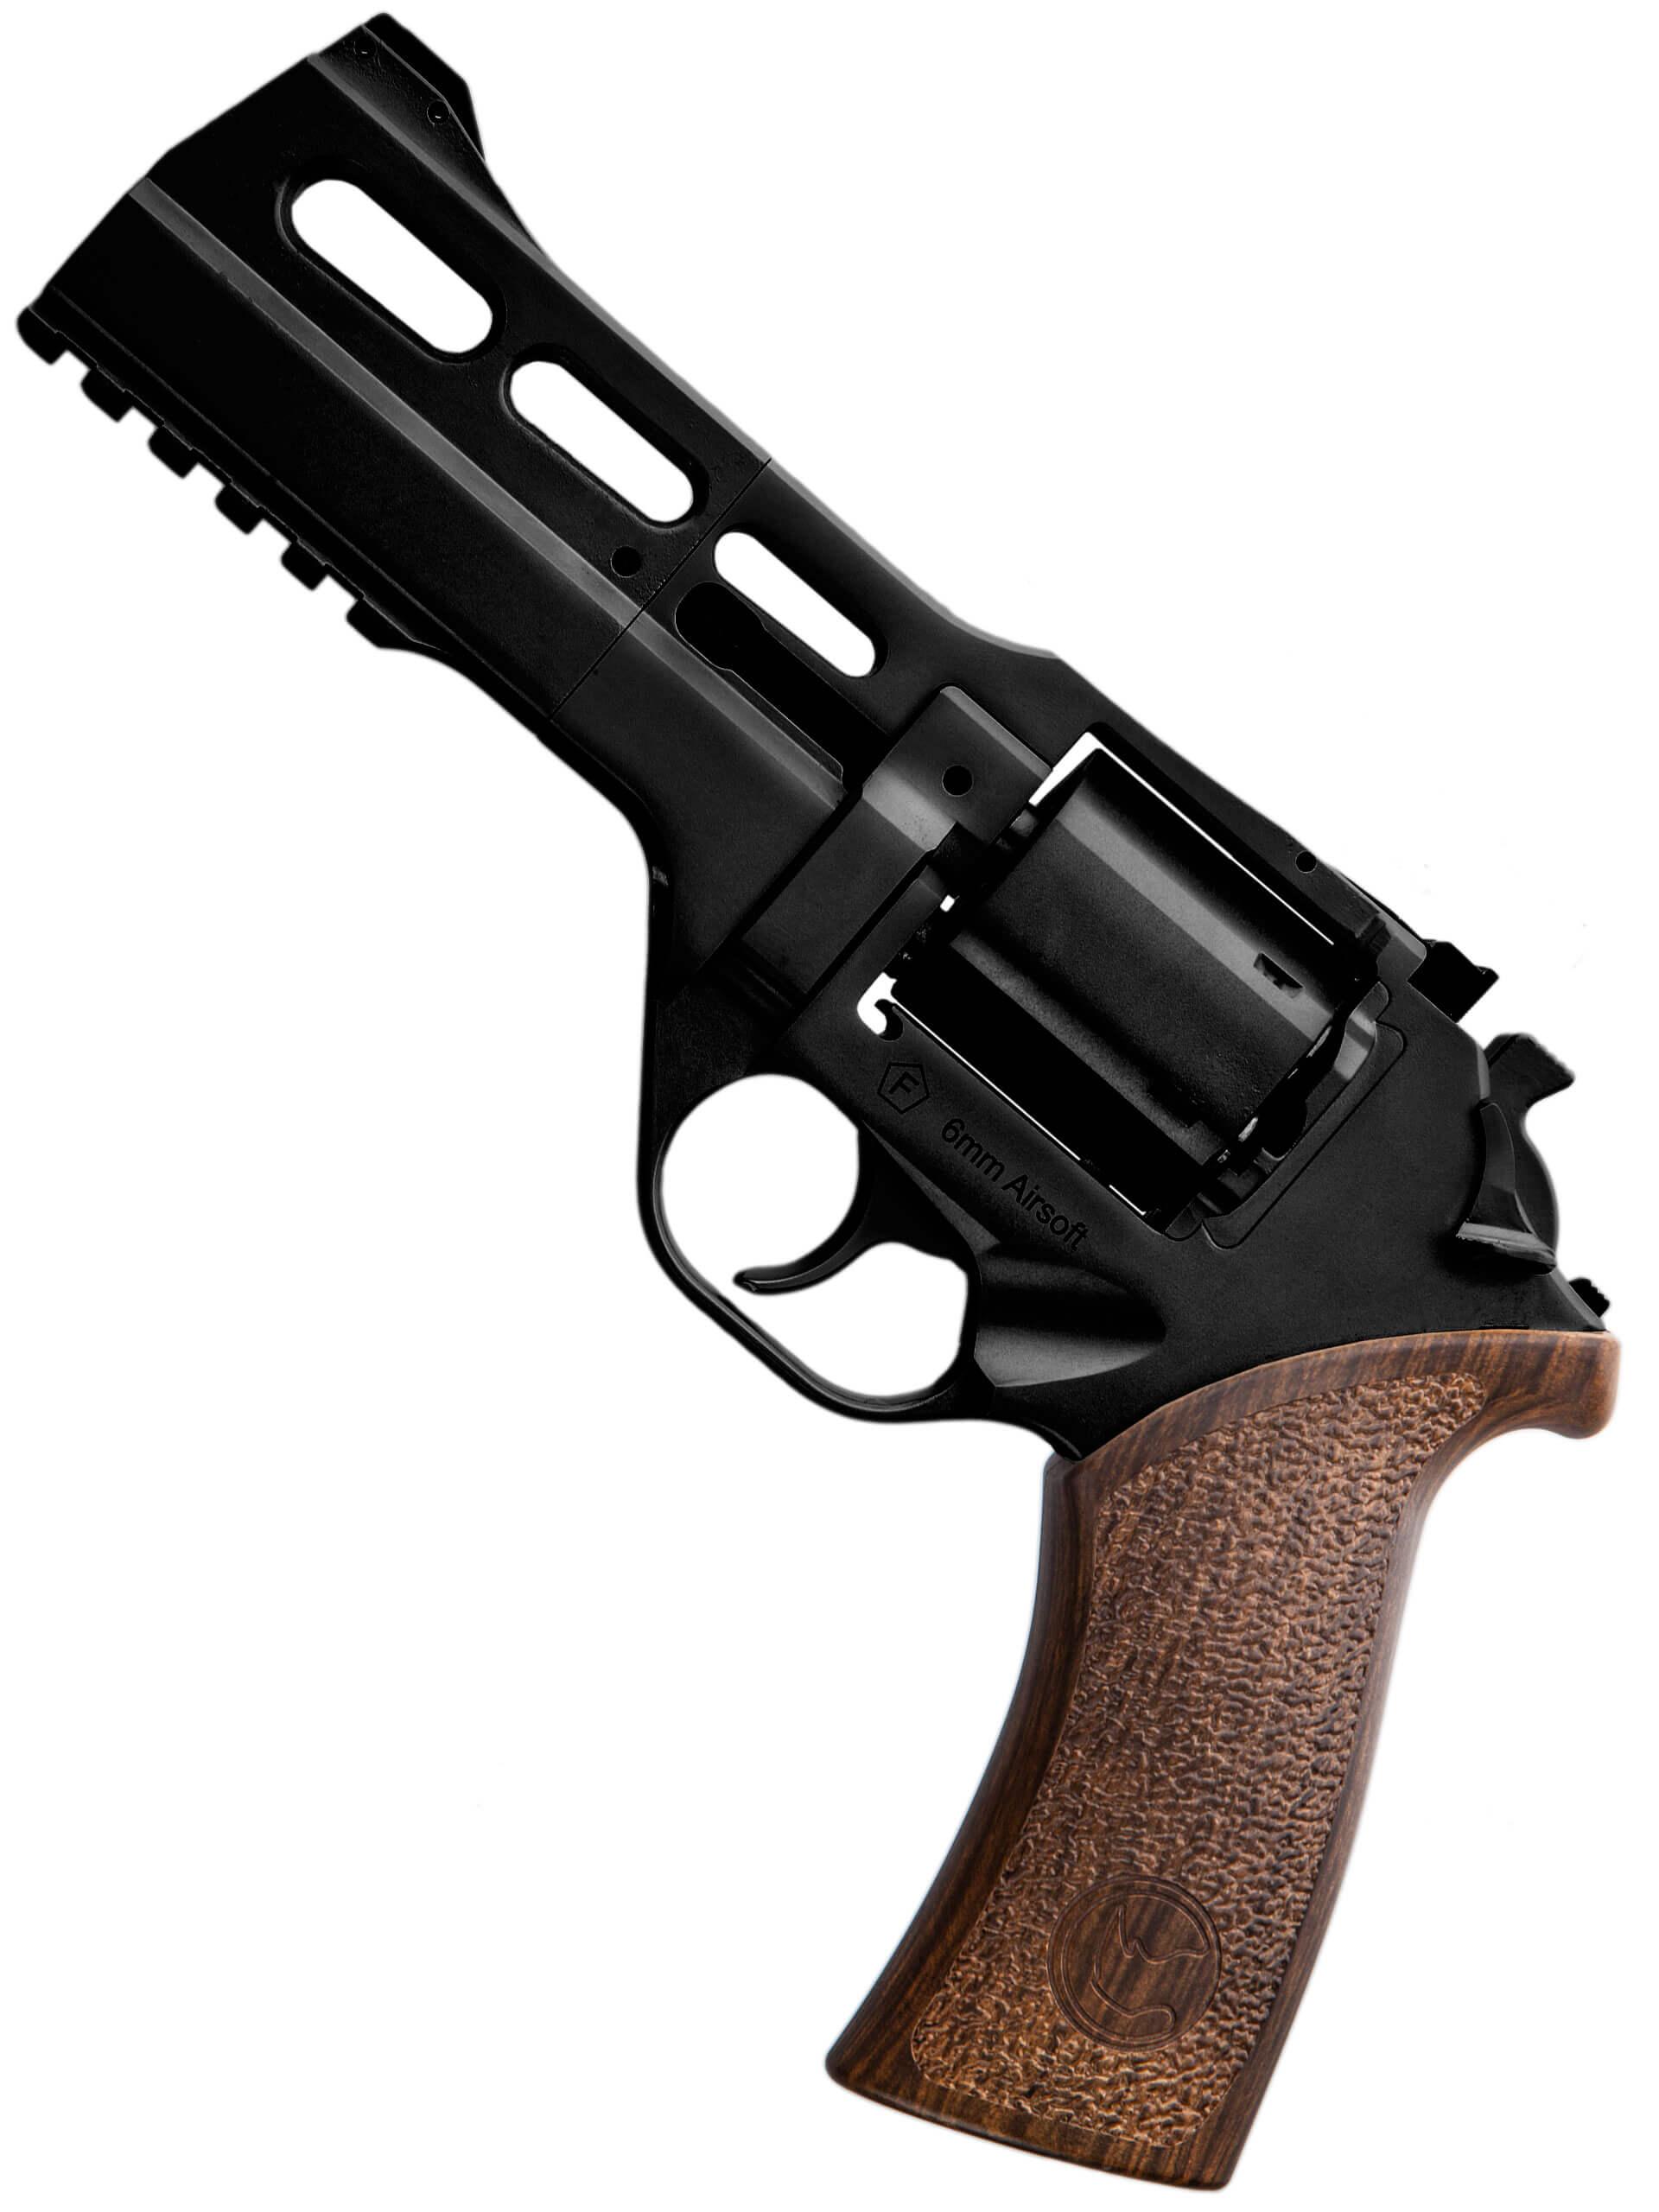 Chiappa Firearms Charging Rhino 50DS .357 Magnum CO2 Revolver, Black